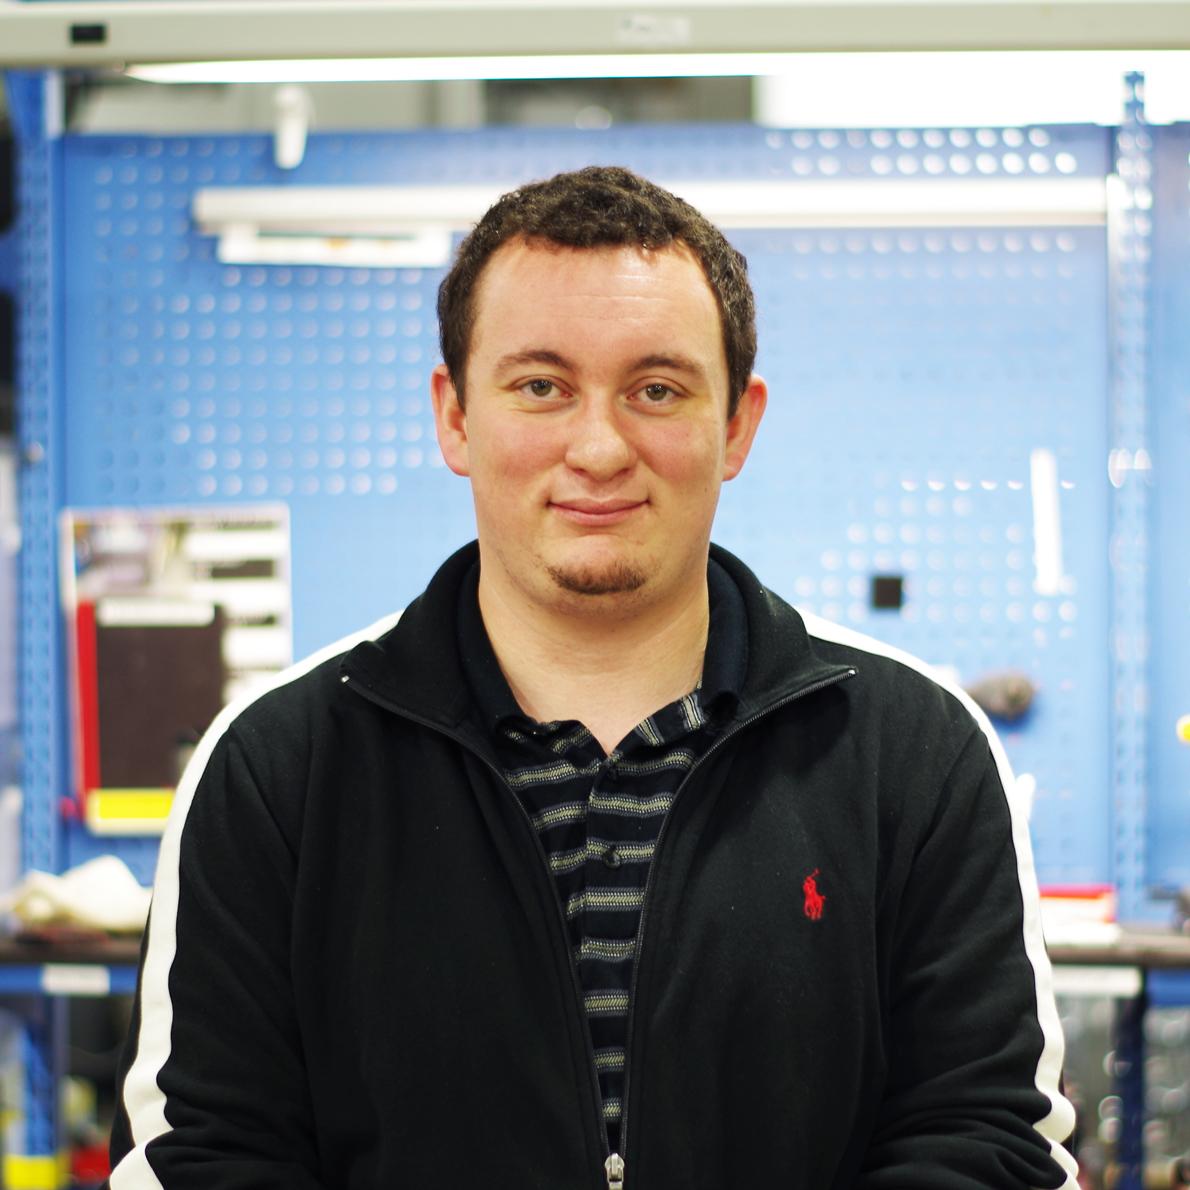 From Co-Op to Associate Engineer – Dave Cranstoun